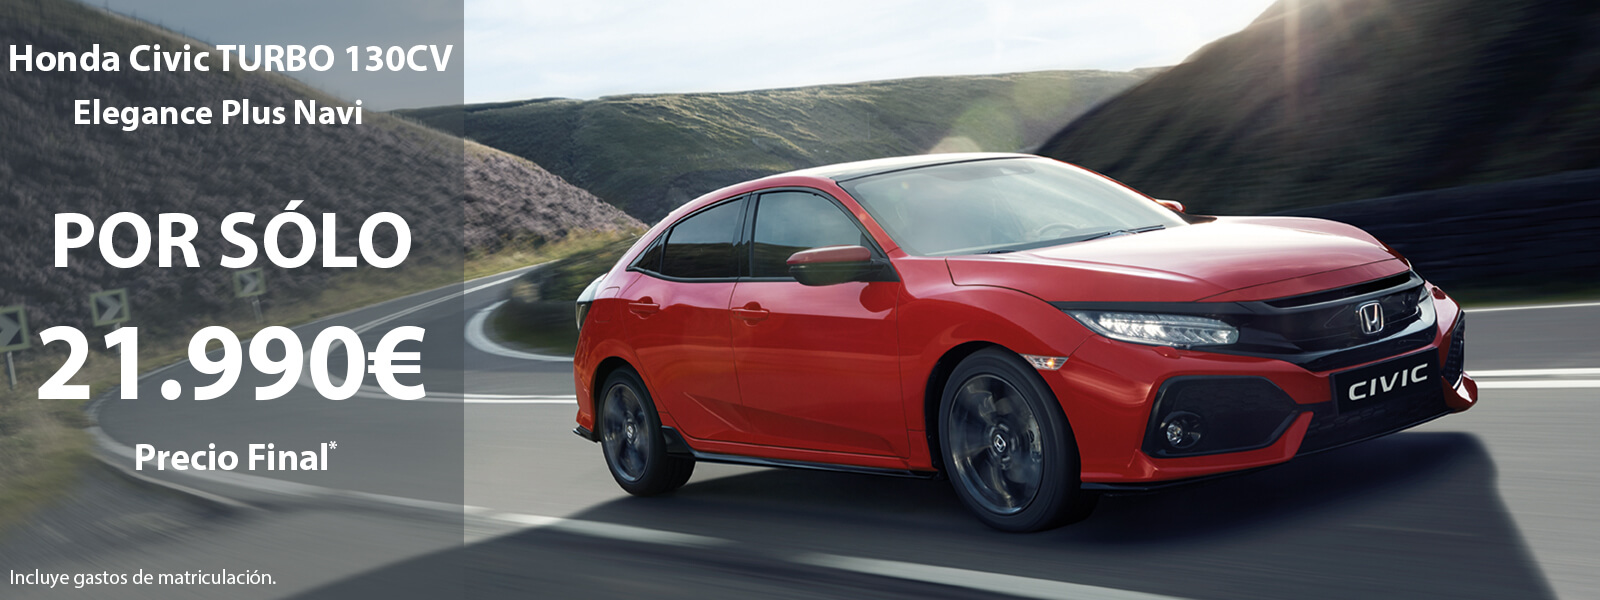 Oferta Honda CIVIC Turbo Nuevo - 21.990€